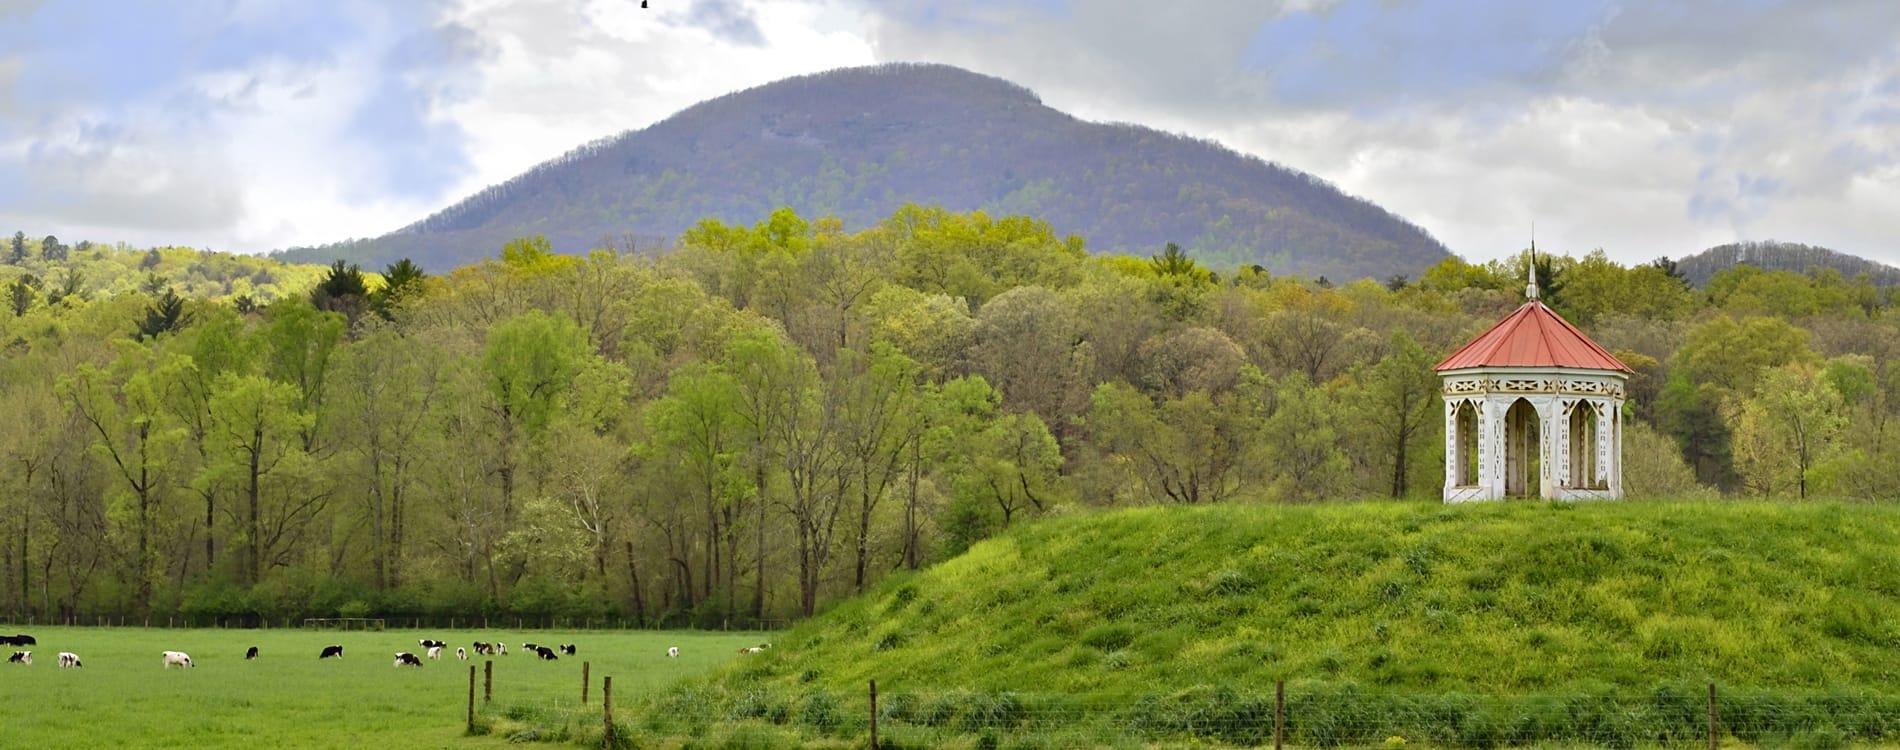 Helen, GA - Nacoochee Indian Mound